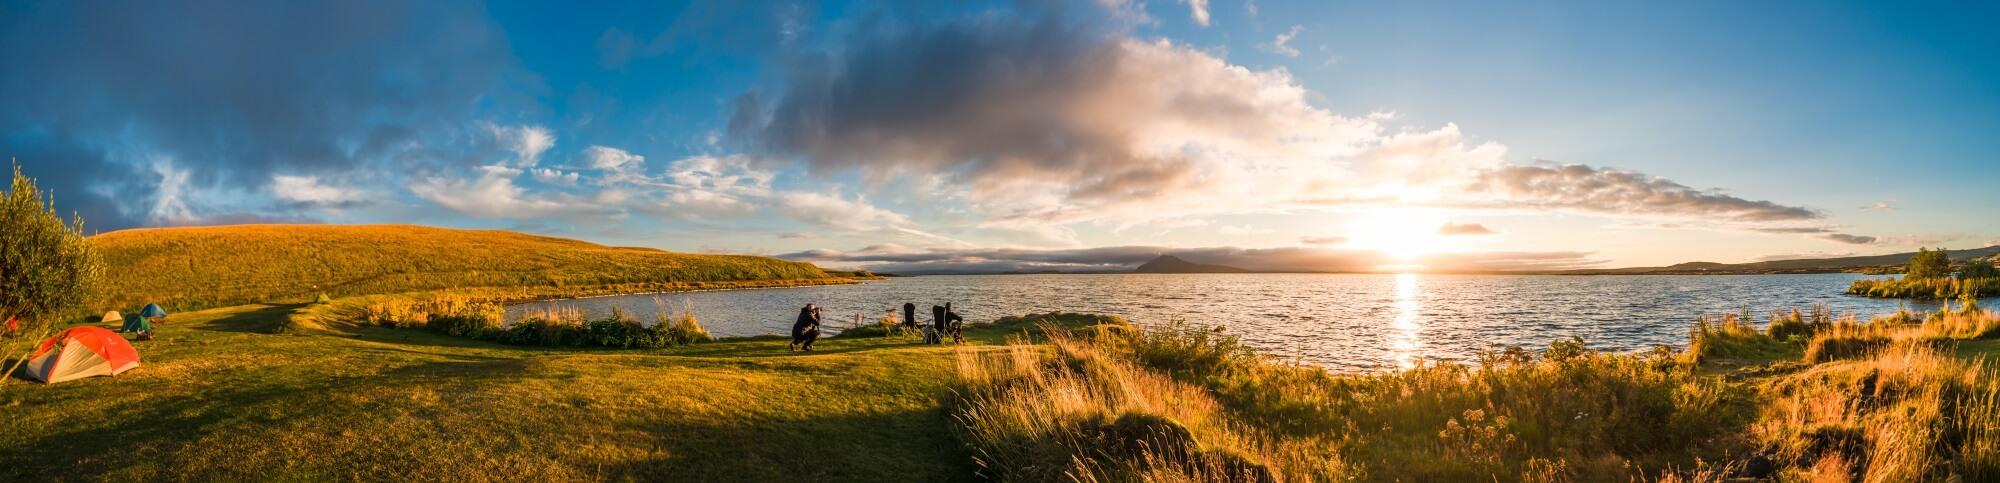 Camping Island Panorama